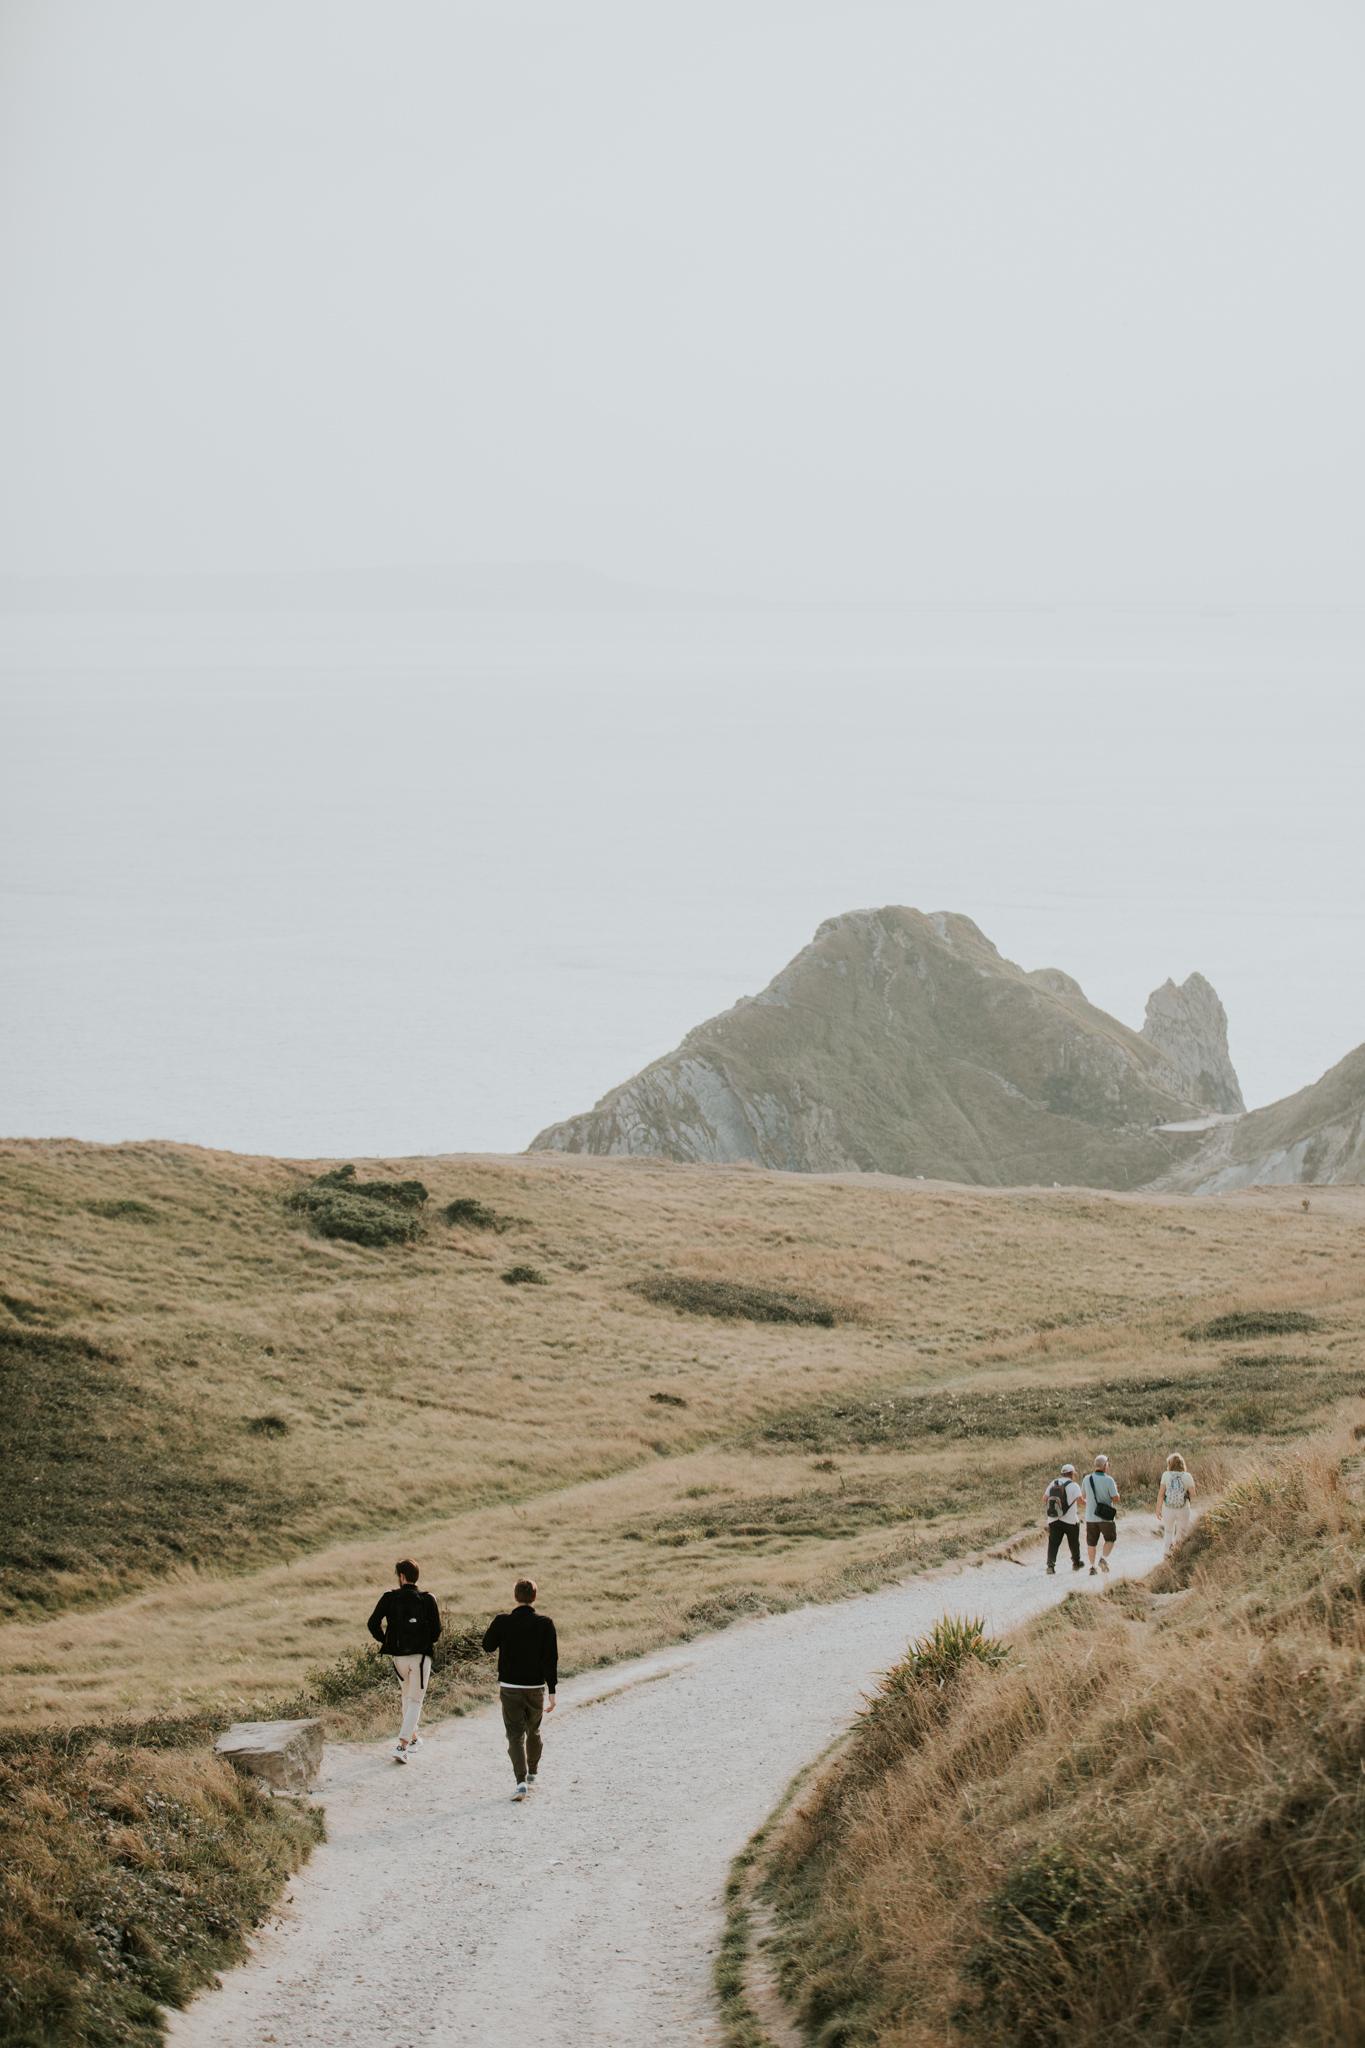 Natalie Skoric - England Travel Photography (133).jpg